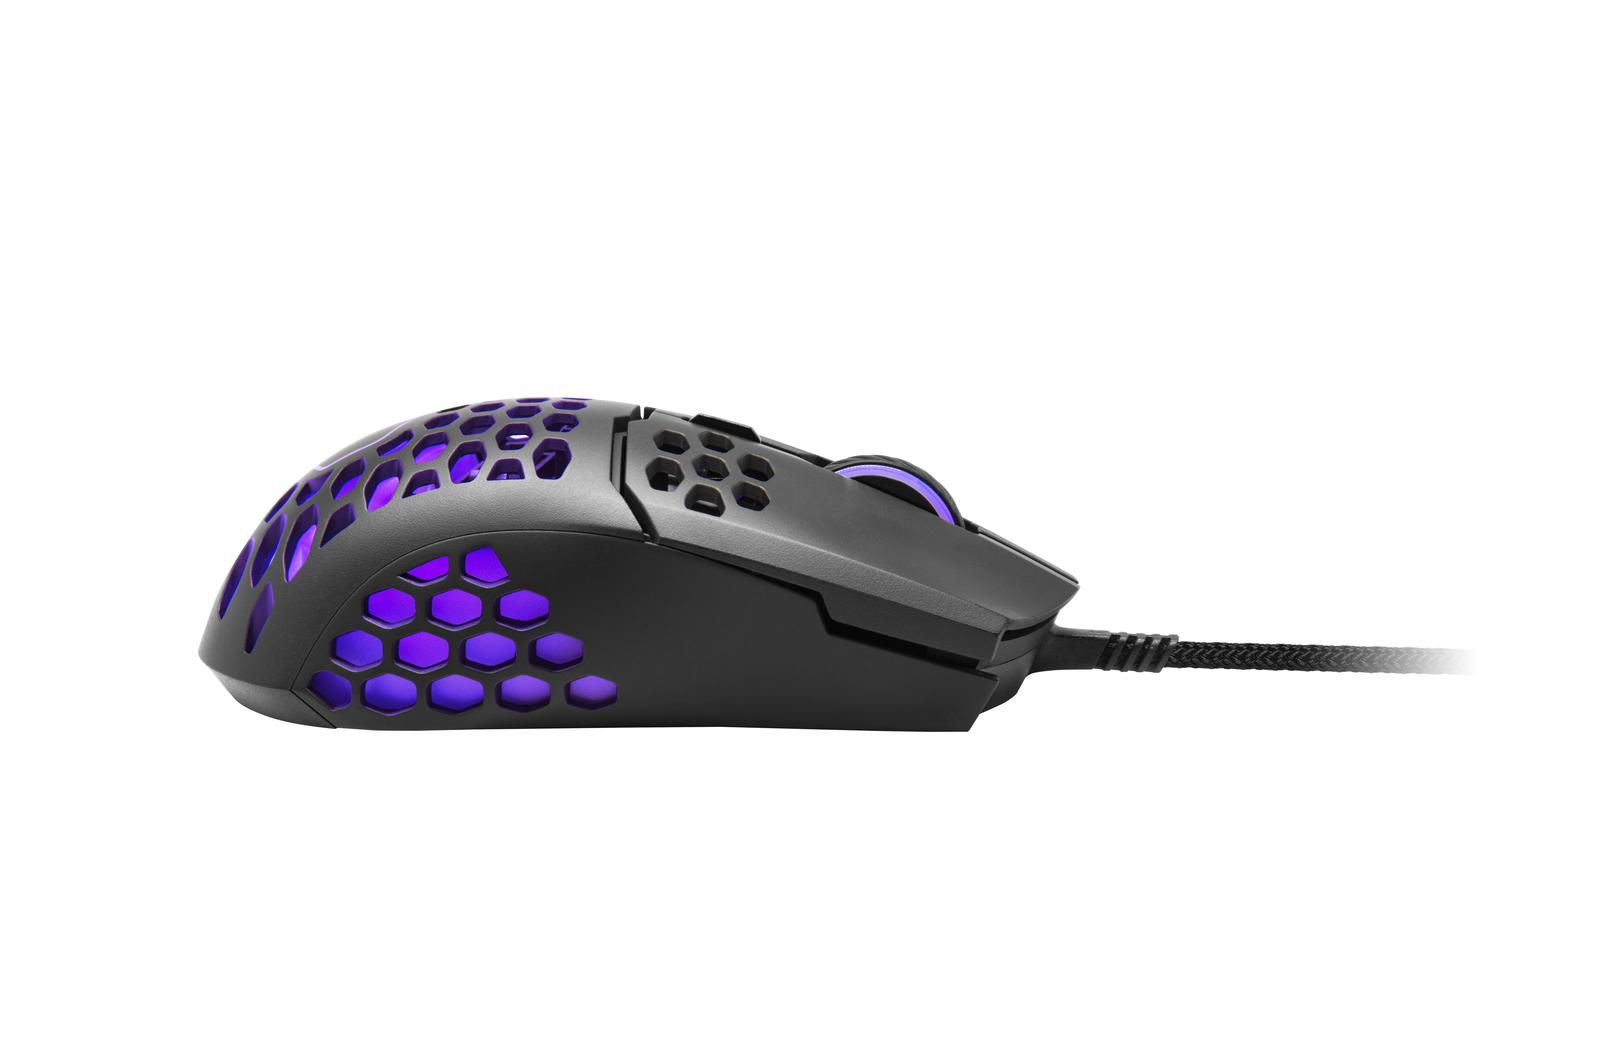 Cooler Master MM711 Black Matte Wired Optical Mouse